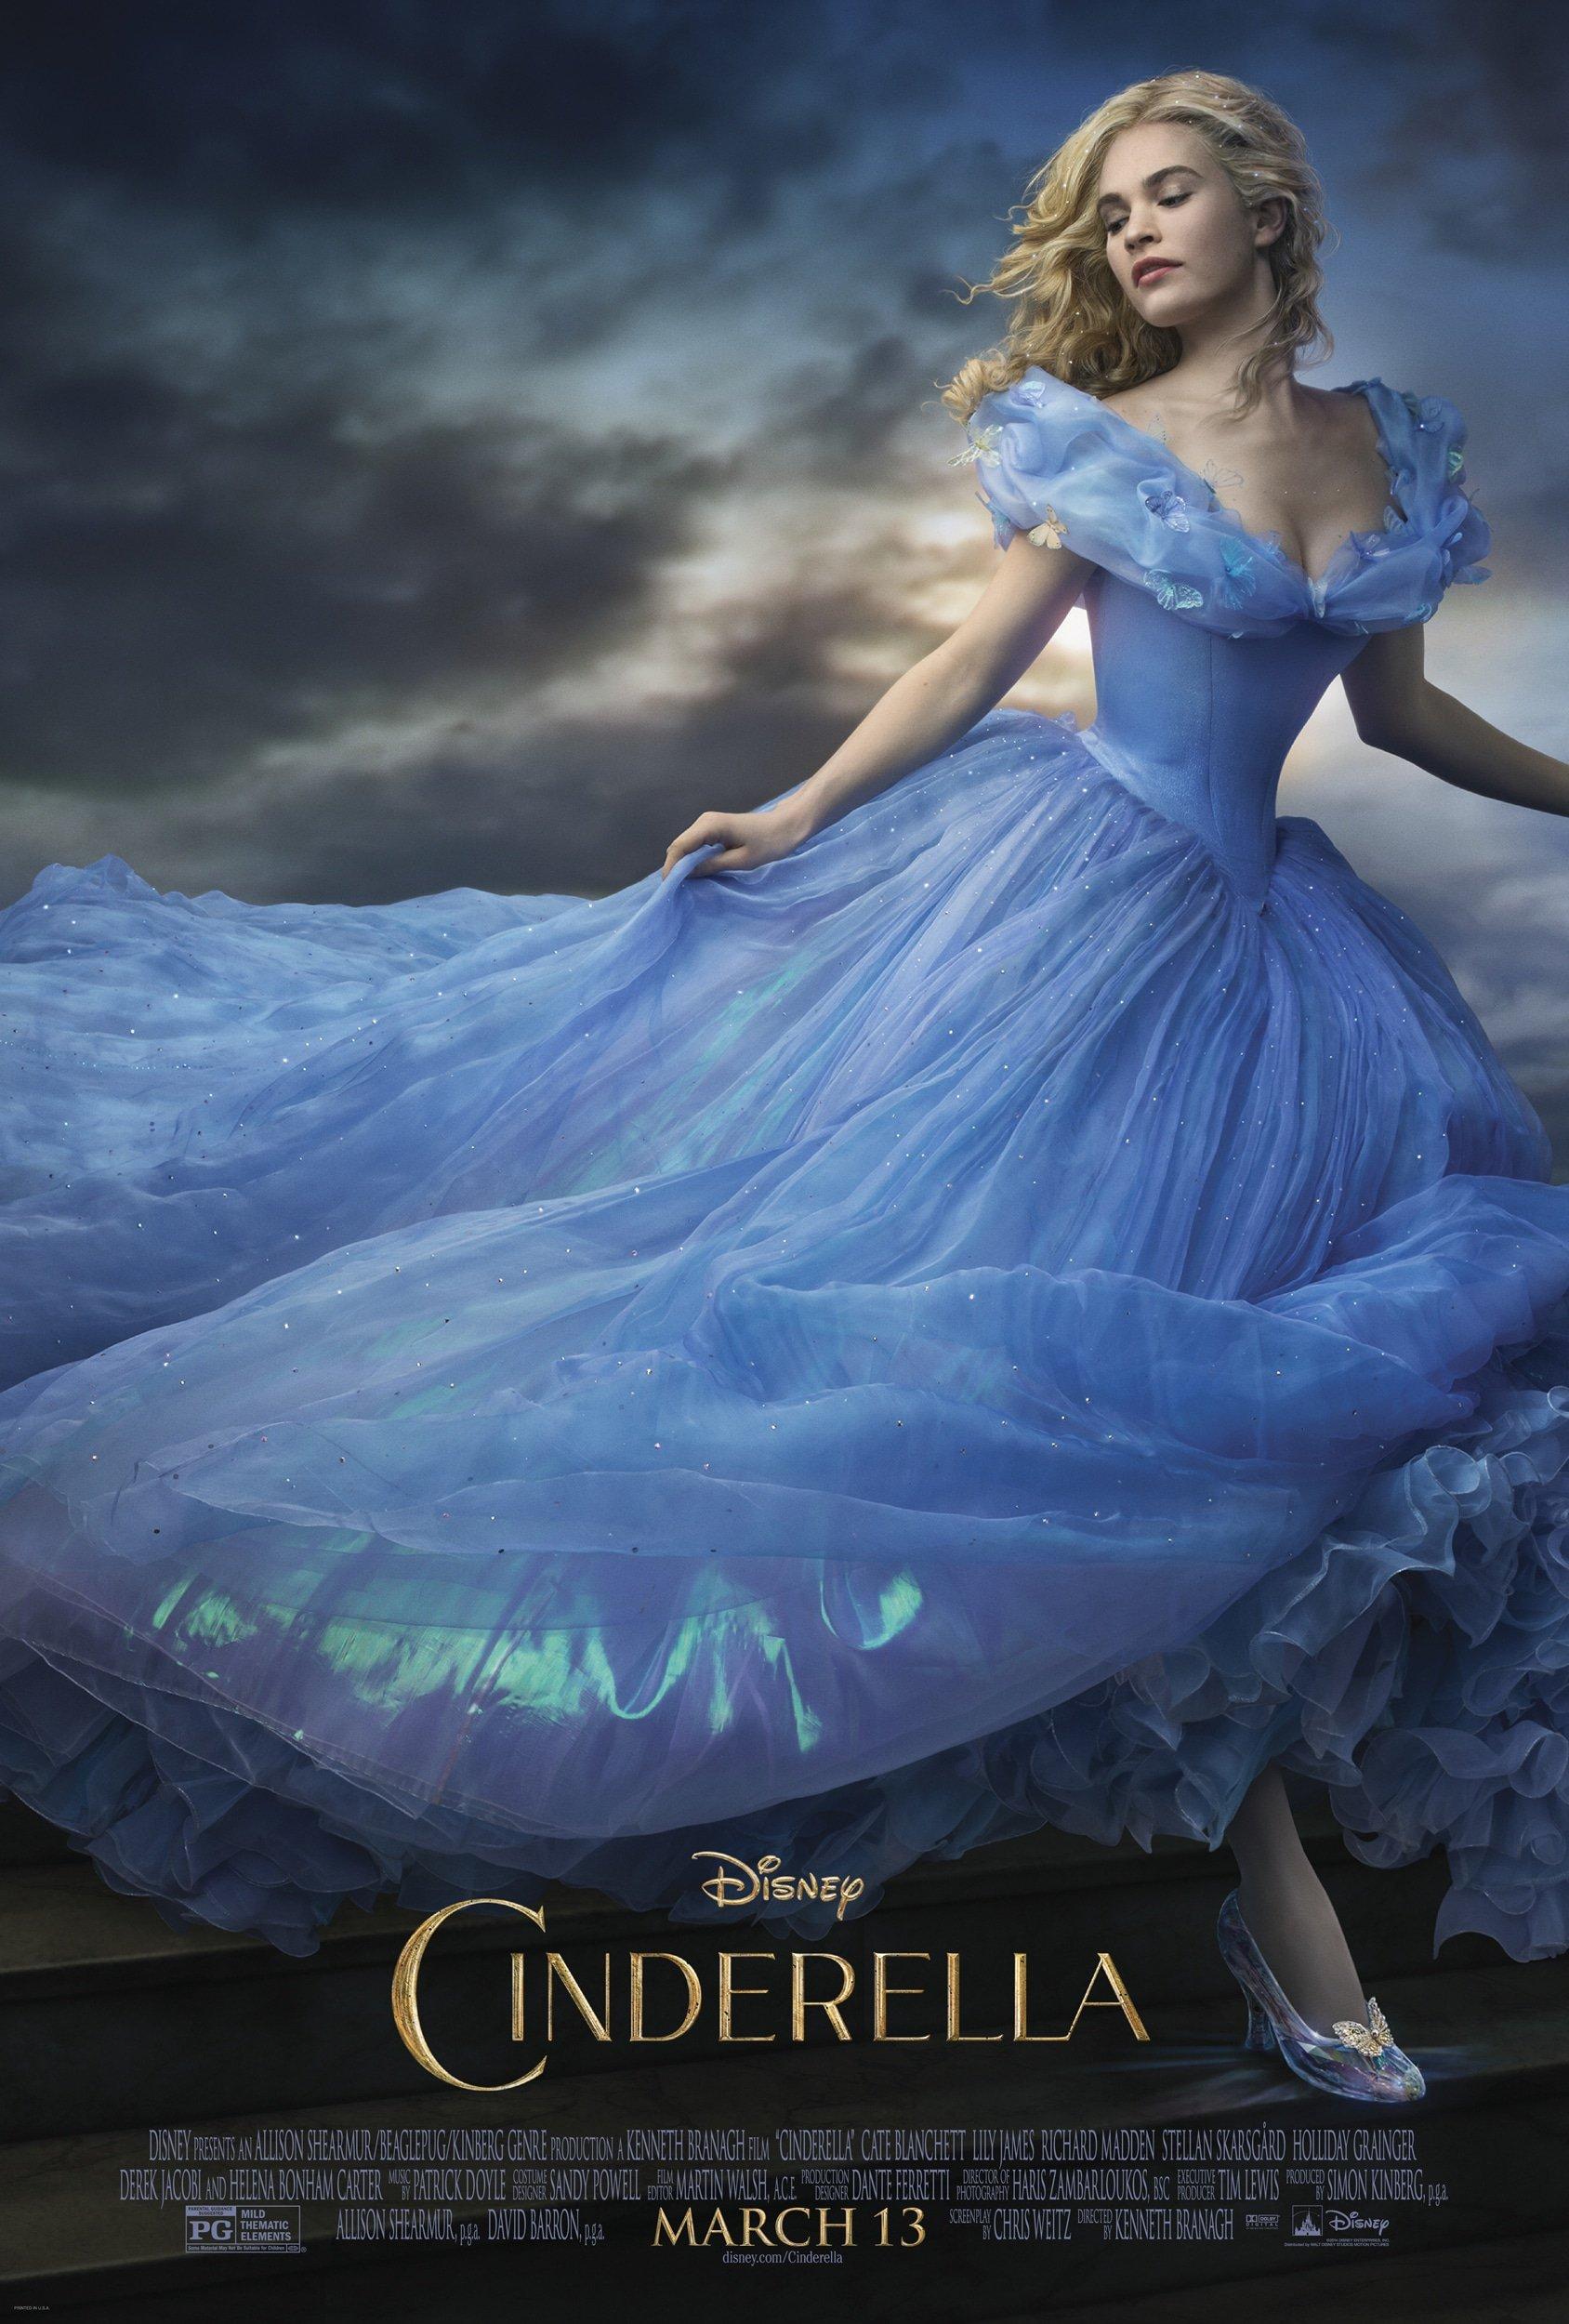 Walt Disney Studios Presents Cinderella